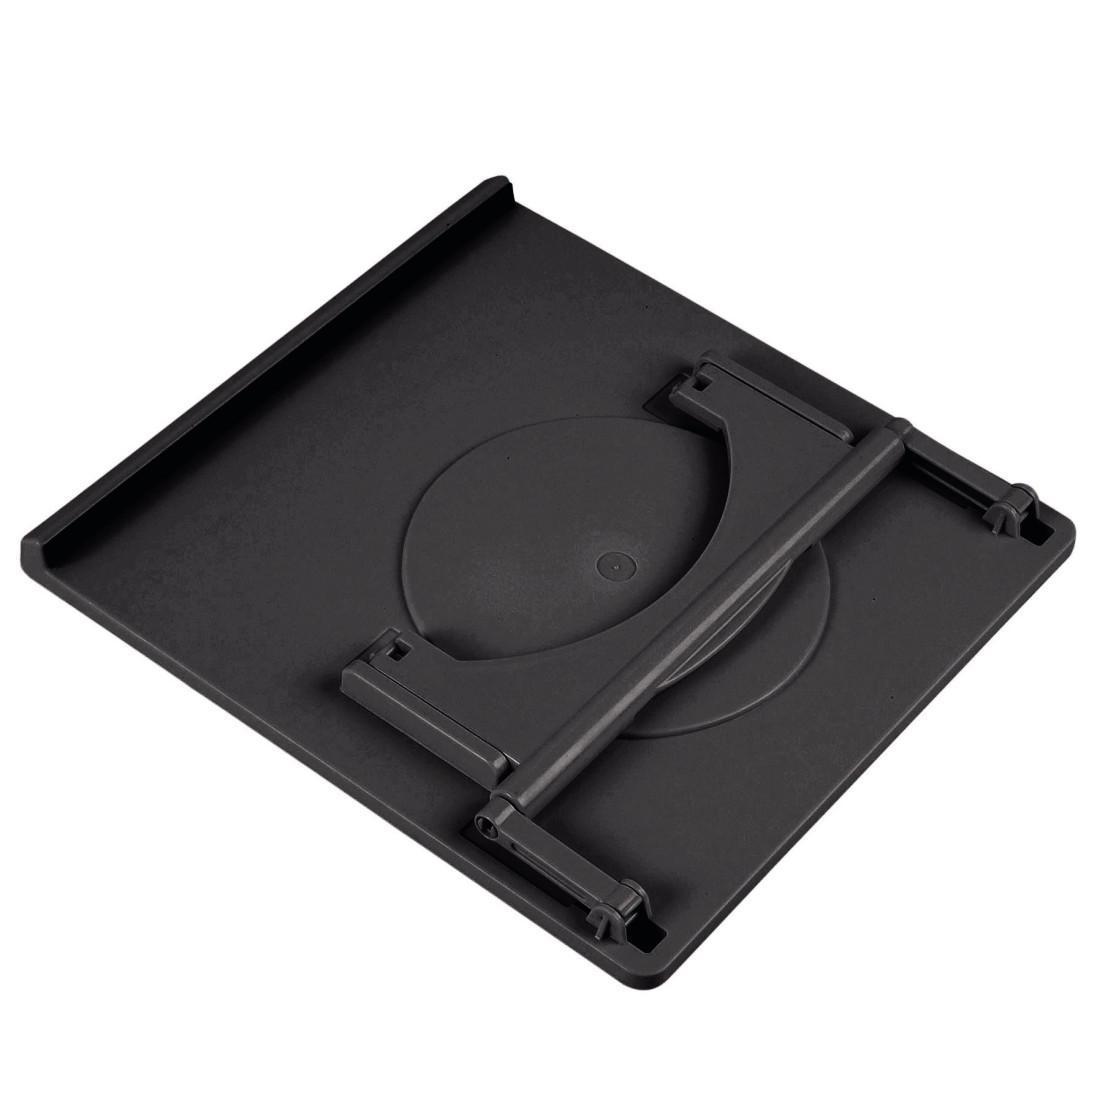 Поставка за лаптоп HAMA 51062, 15.4, 360°, Черен